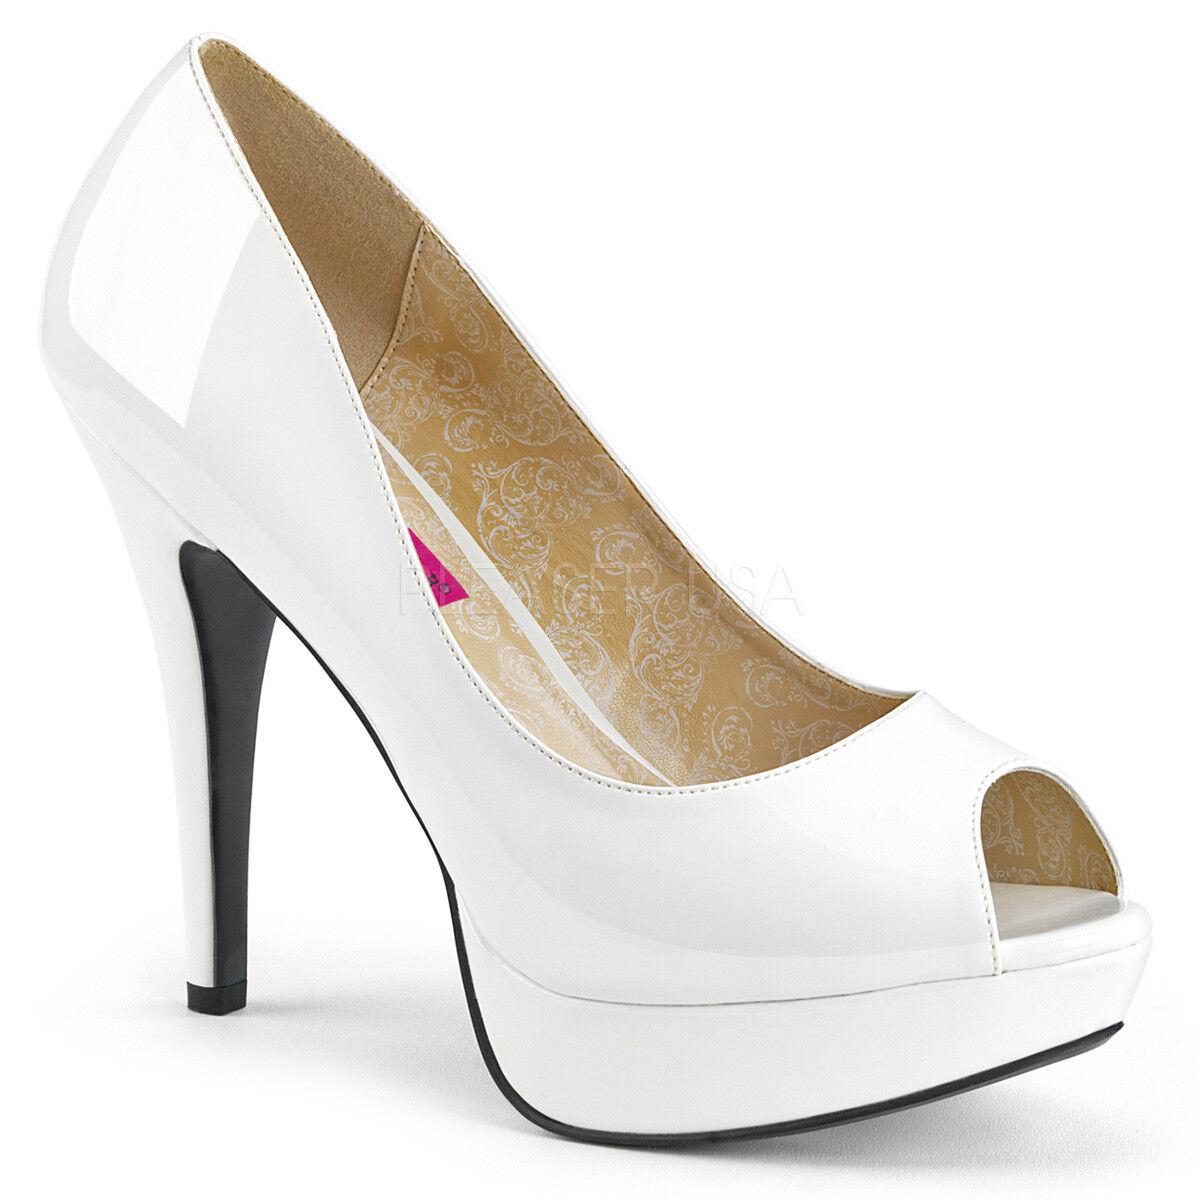 Pleaser CHLOE-01 Womens Sexy Peep Toe White Patent Concealed Platform High Heel